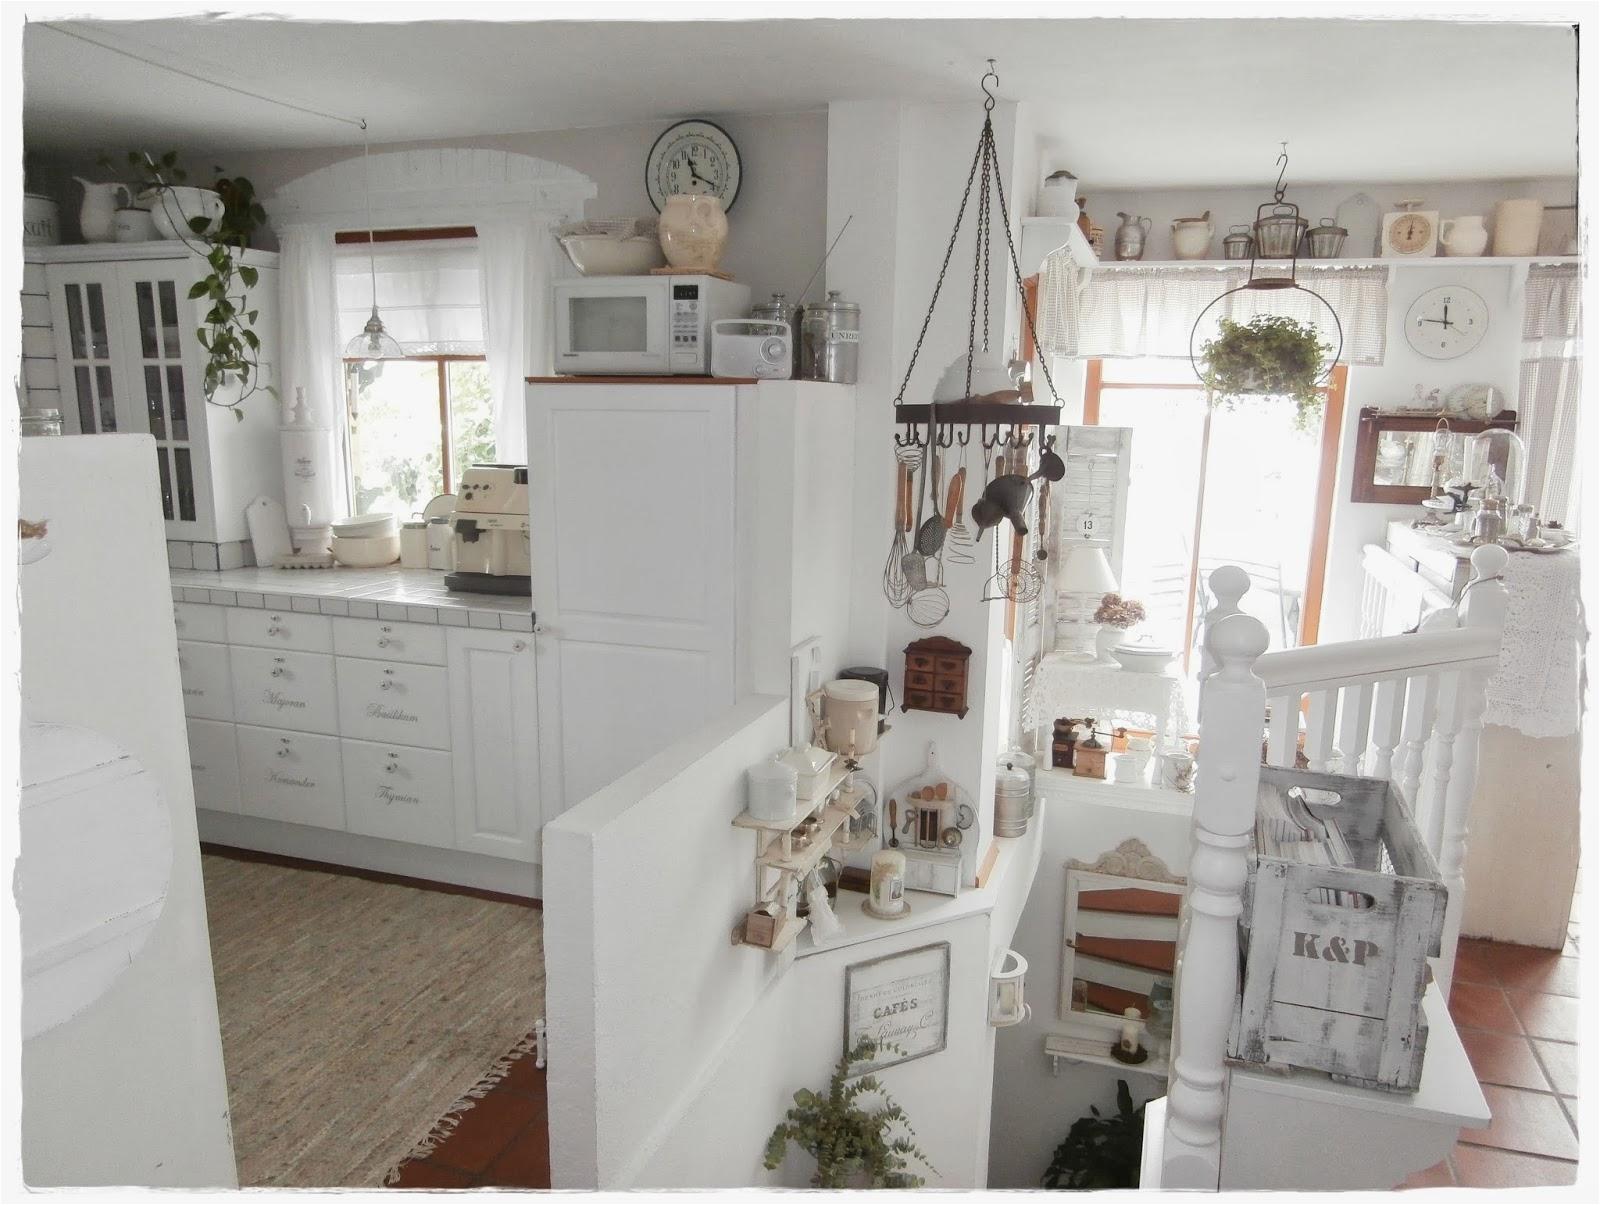 Küche 2012 JPG